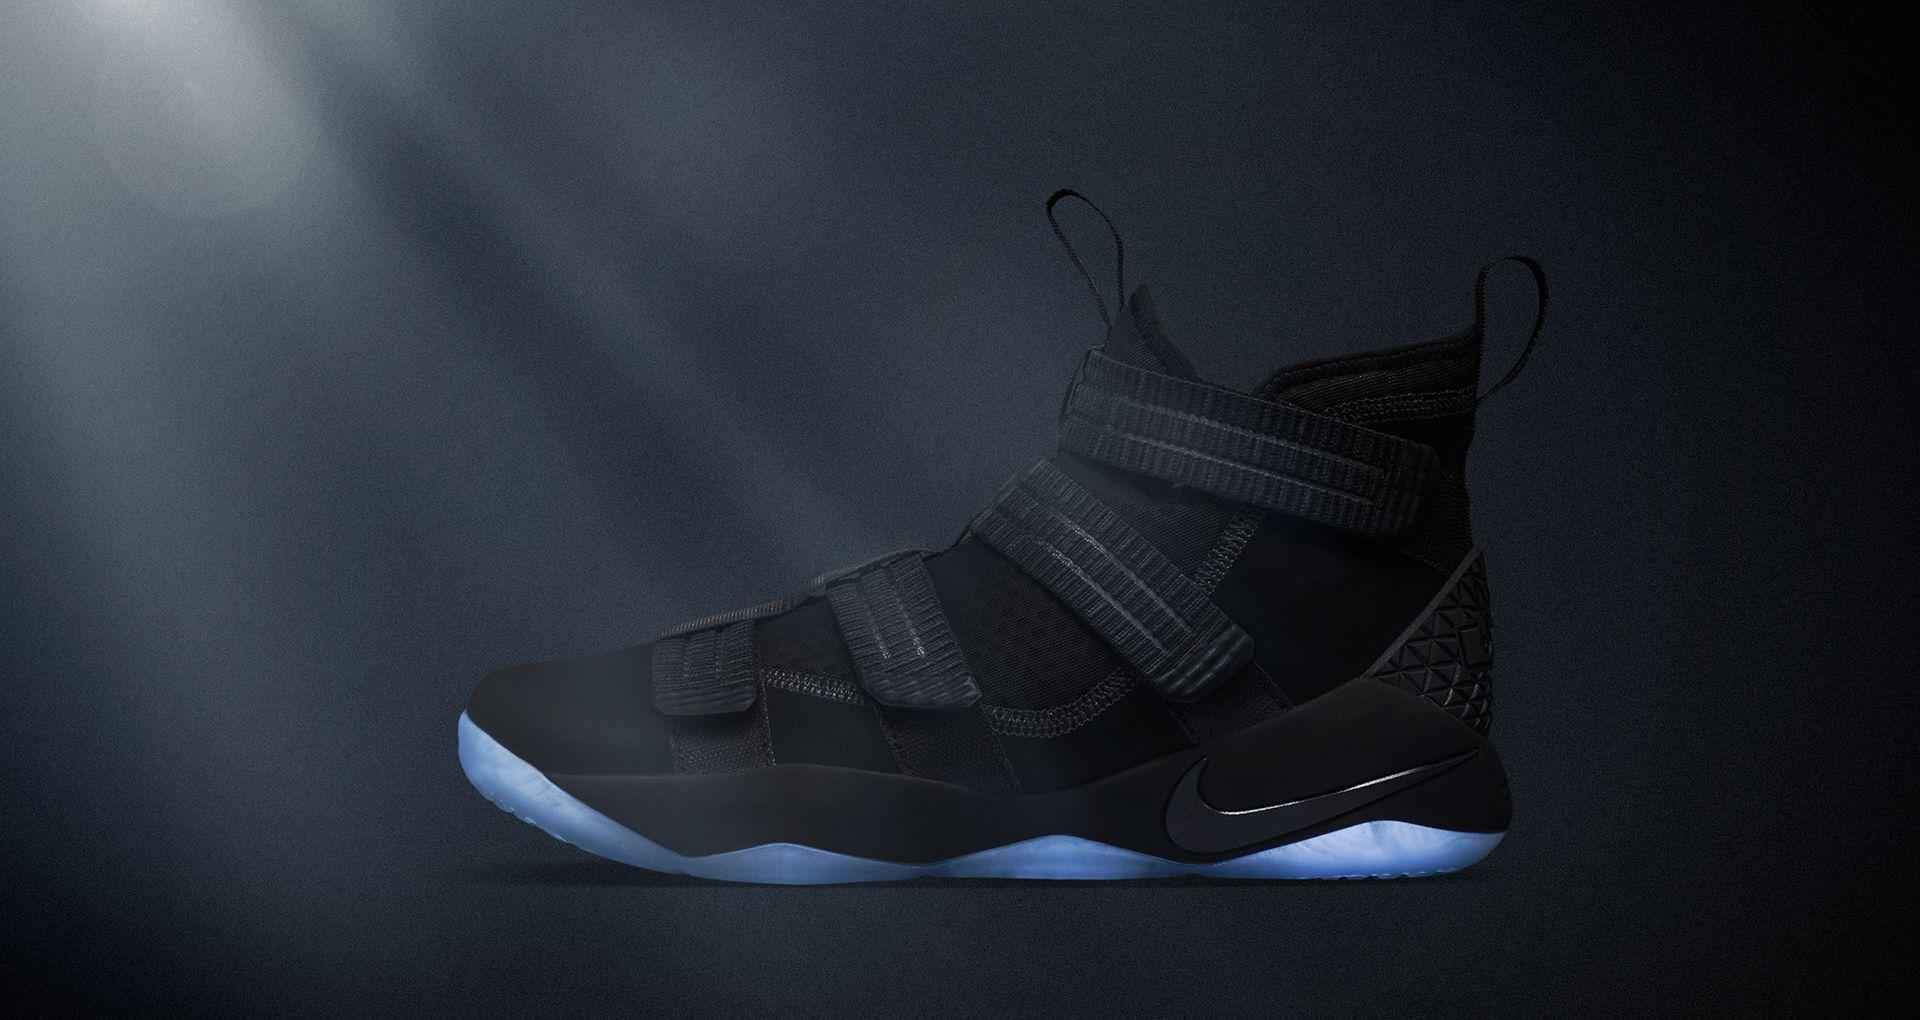 57b59894684 Nike LeBron Soldier XI Prototype  Black . Nike+ SNKRS